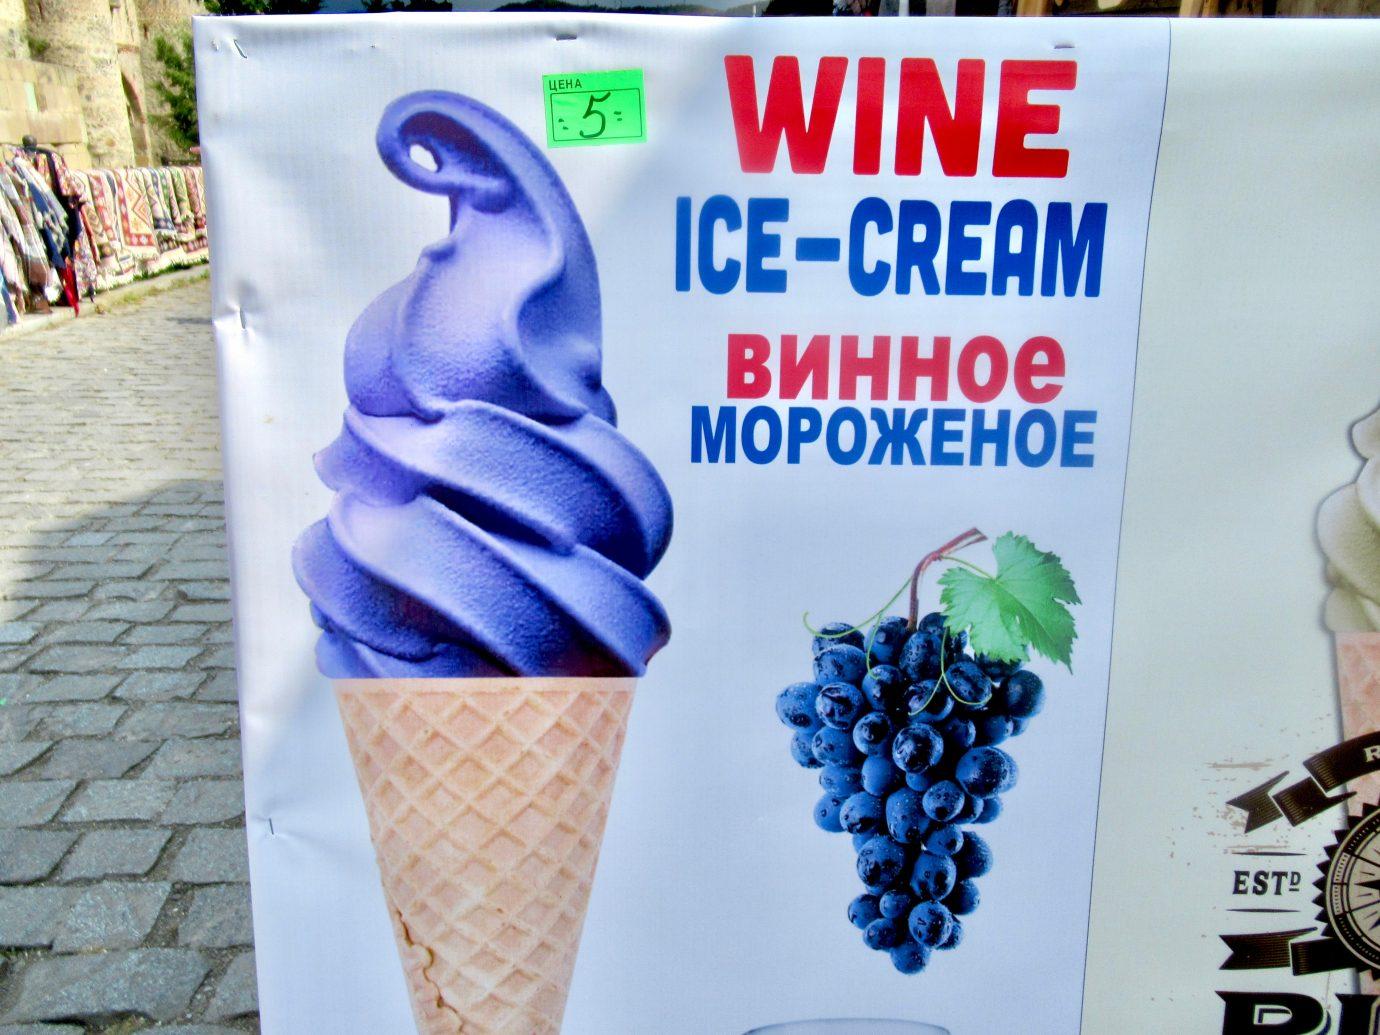 Wine ice cream sign